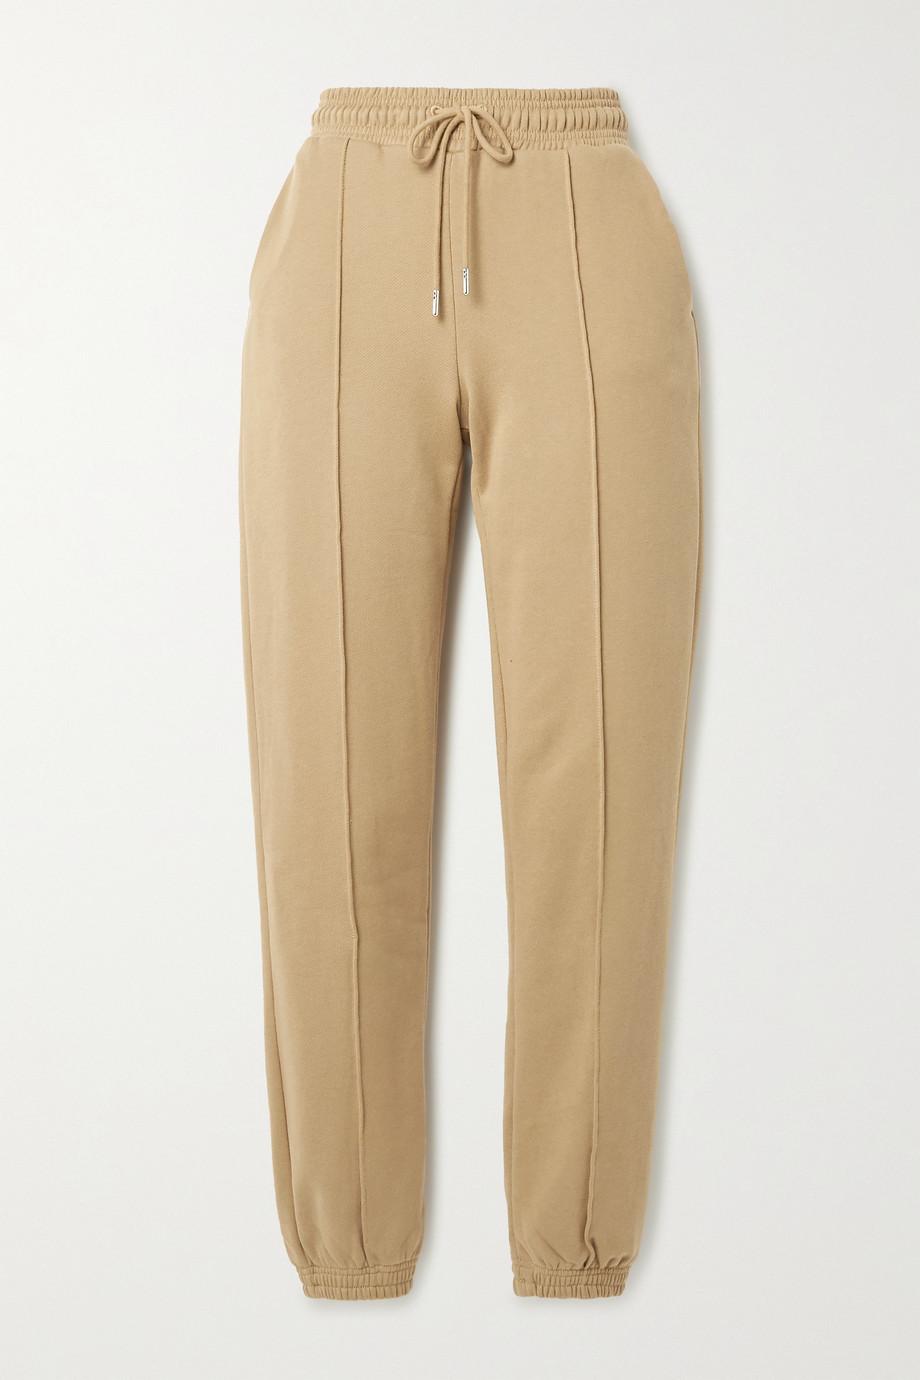 Ninety Percent Boy Fit organic cotton-jersey track pants